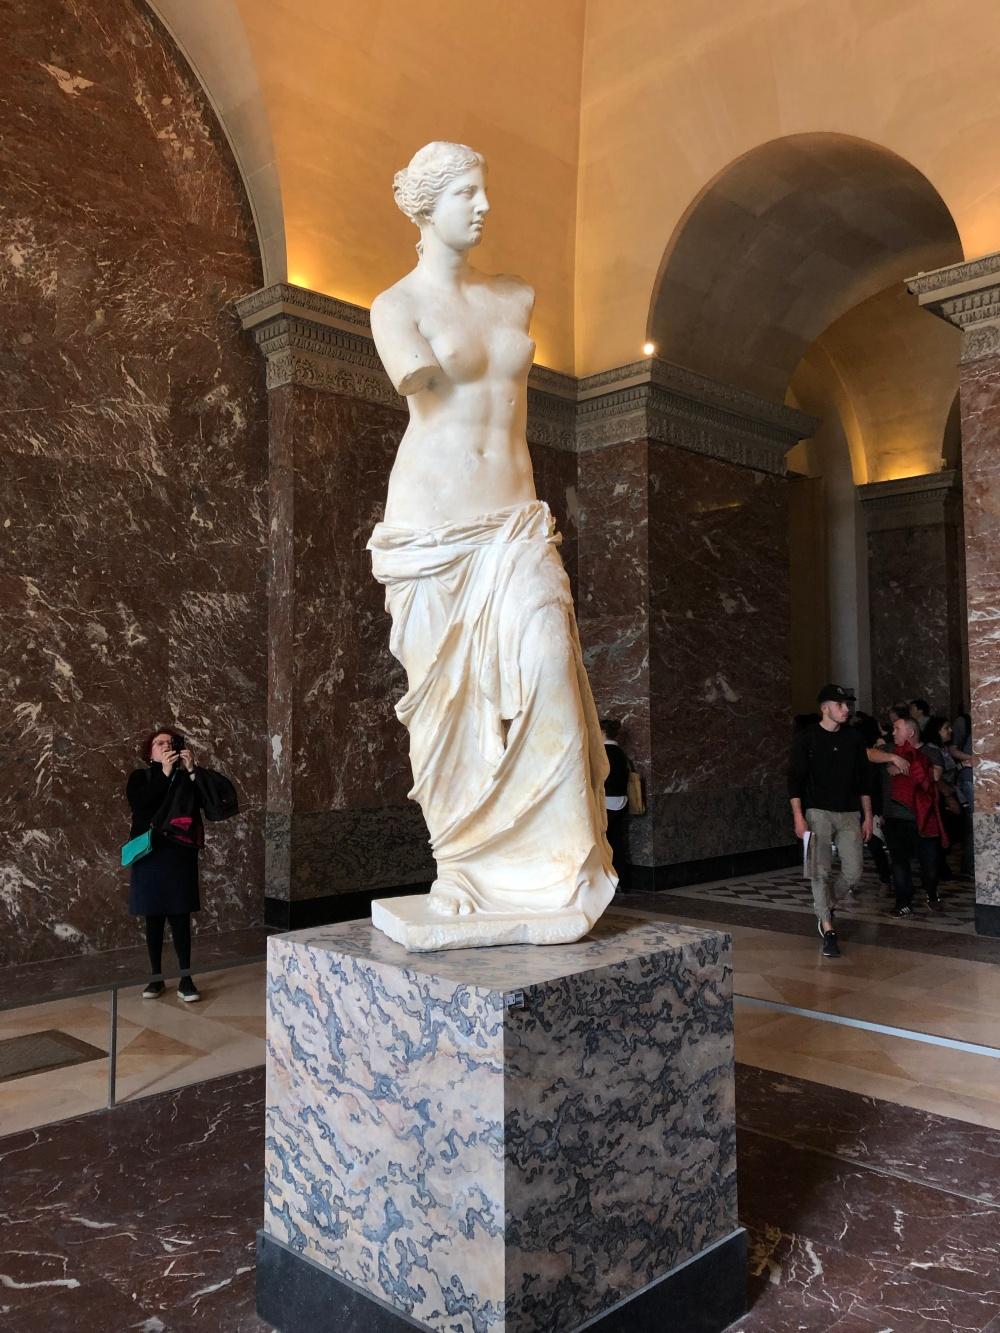 Paris - Jenny Rojas Apr19 - Jennyskyisthelimit - The Louvre Museum (30) Pathernon Room Aphrodite Venus de Milo